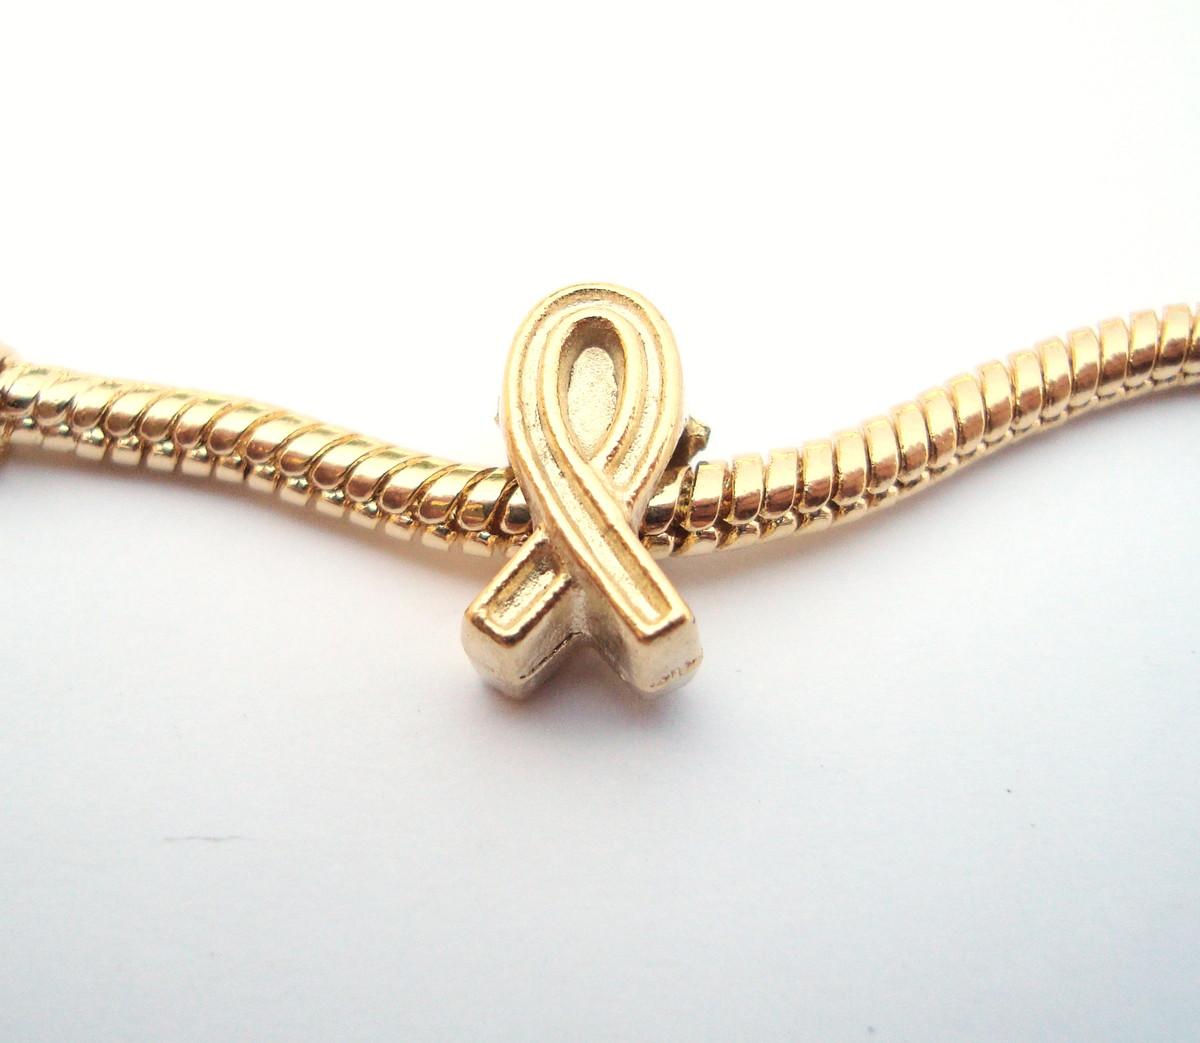 Berloque Banhado Ouro Simbolo Luto No Elo7 Heva Semi Joias A87e45